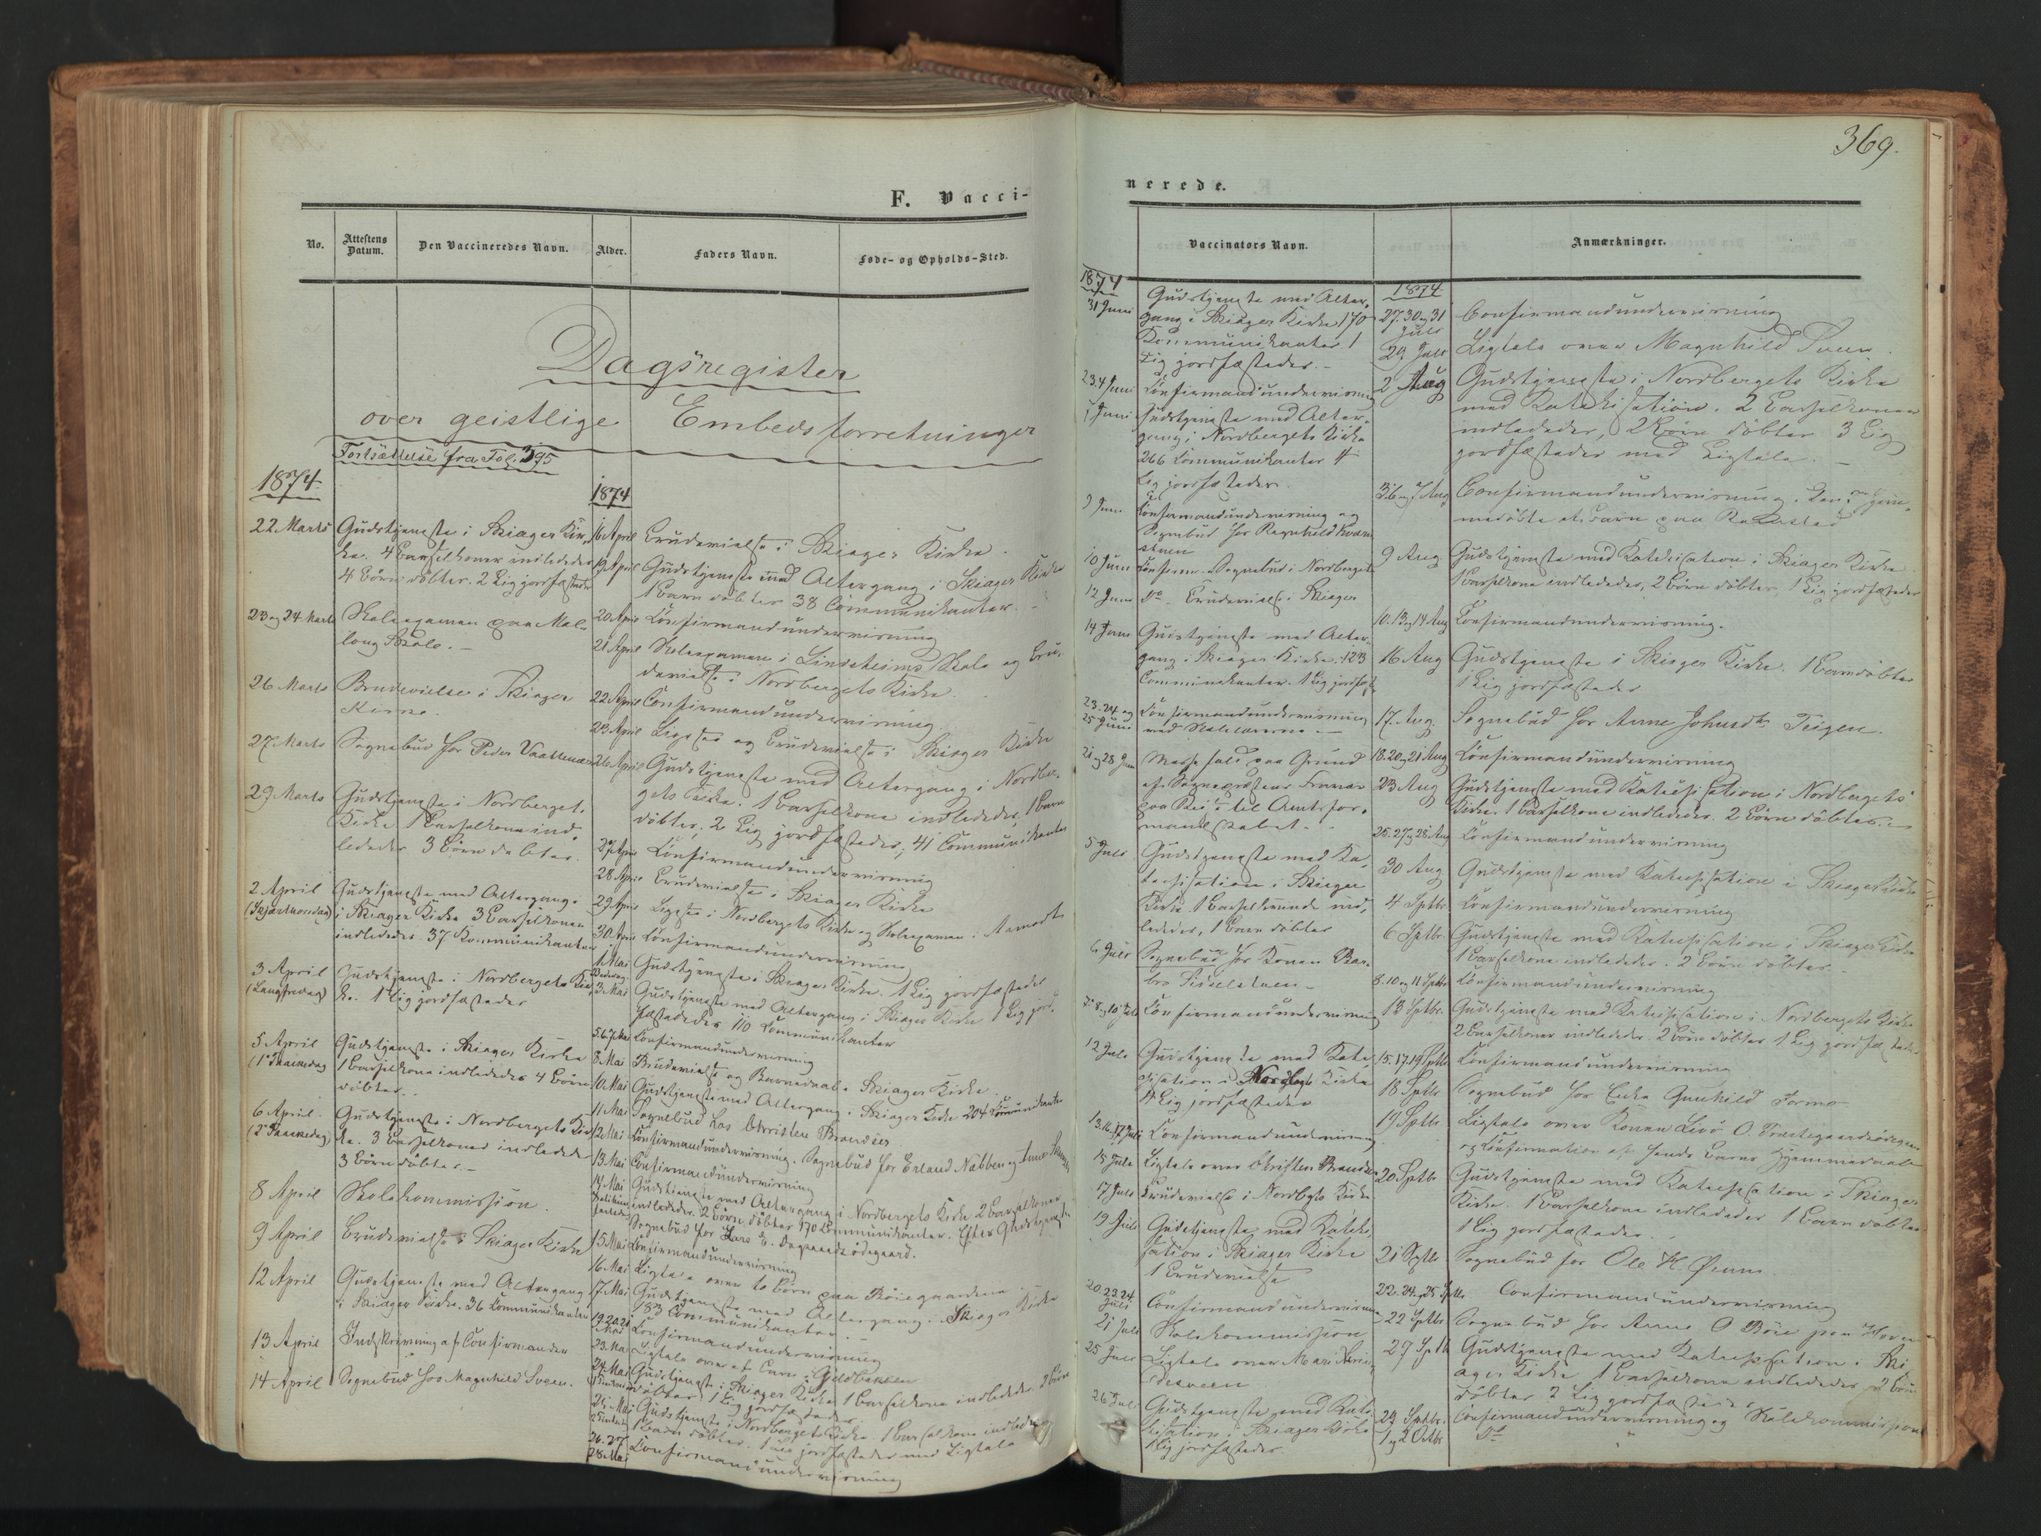 SAH, Skjåk prestekontor, Ministerialbok nr. 1, 1863-1879, s. 369